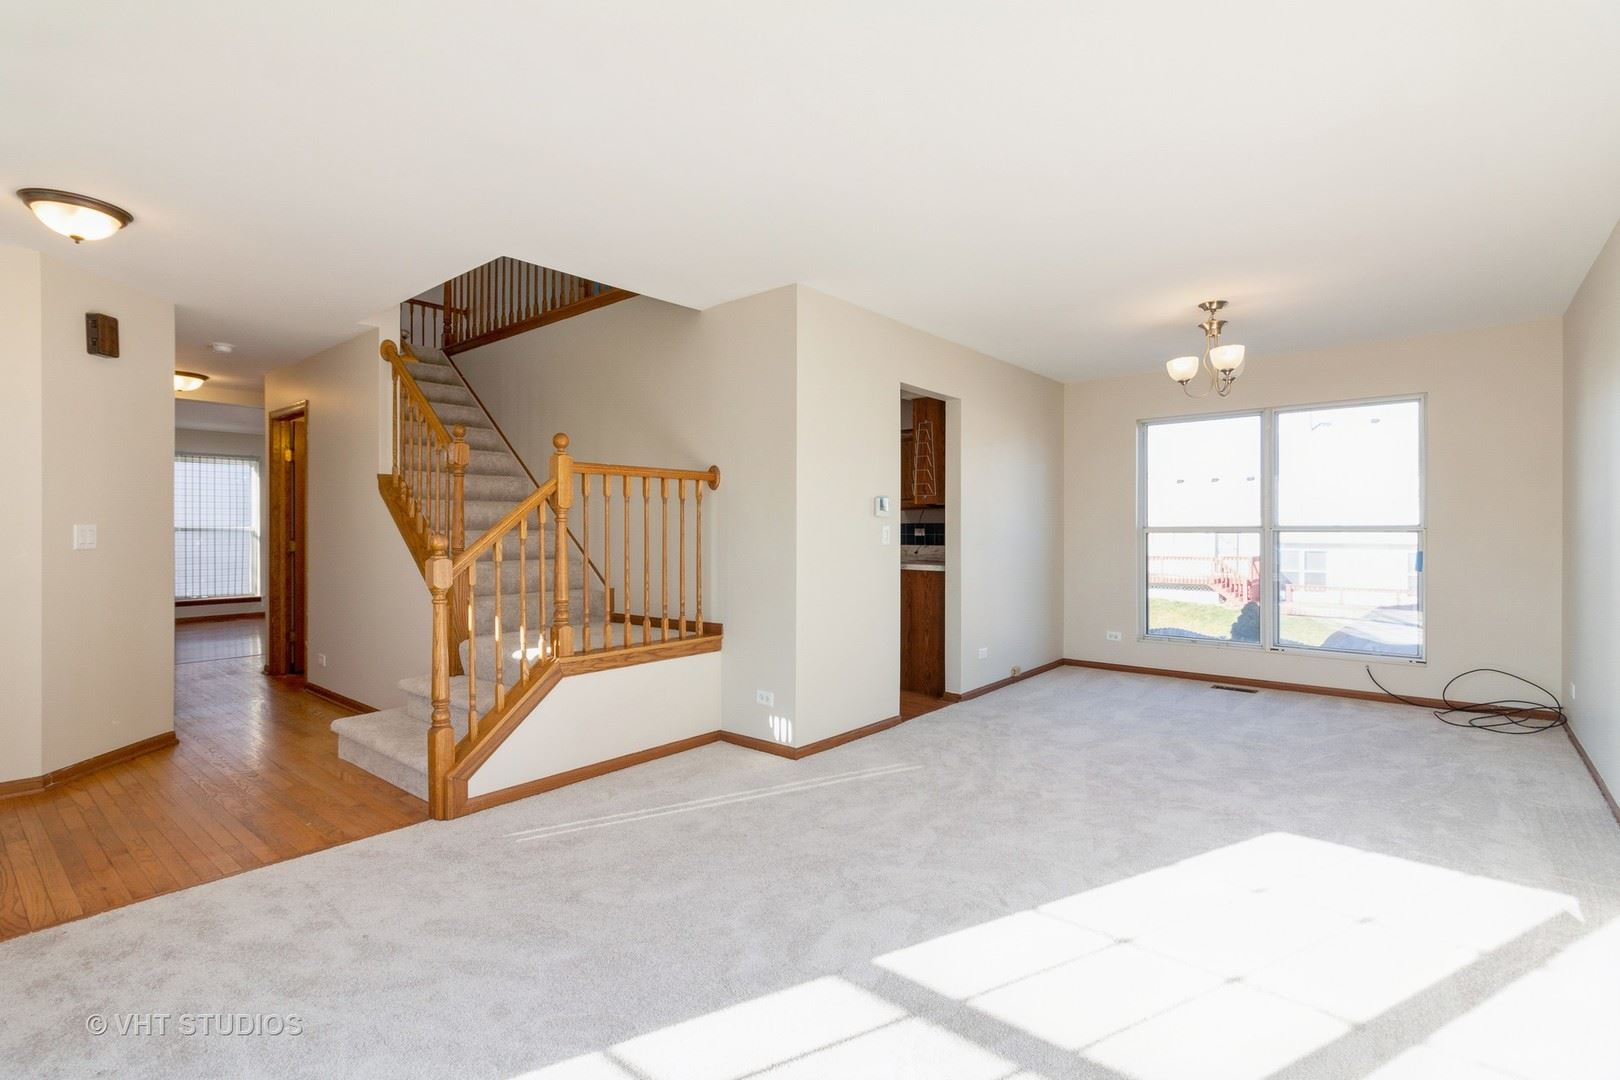 Photo of 452 Monarch Lane, Bolingbrook, IL 60440 (MLS # 10942799)